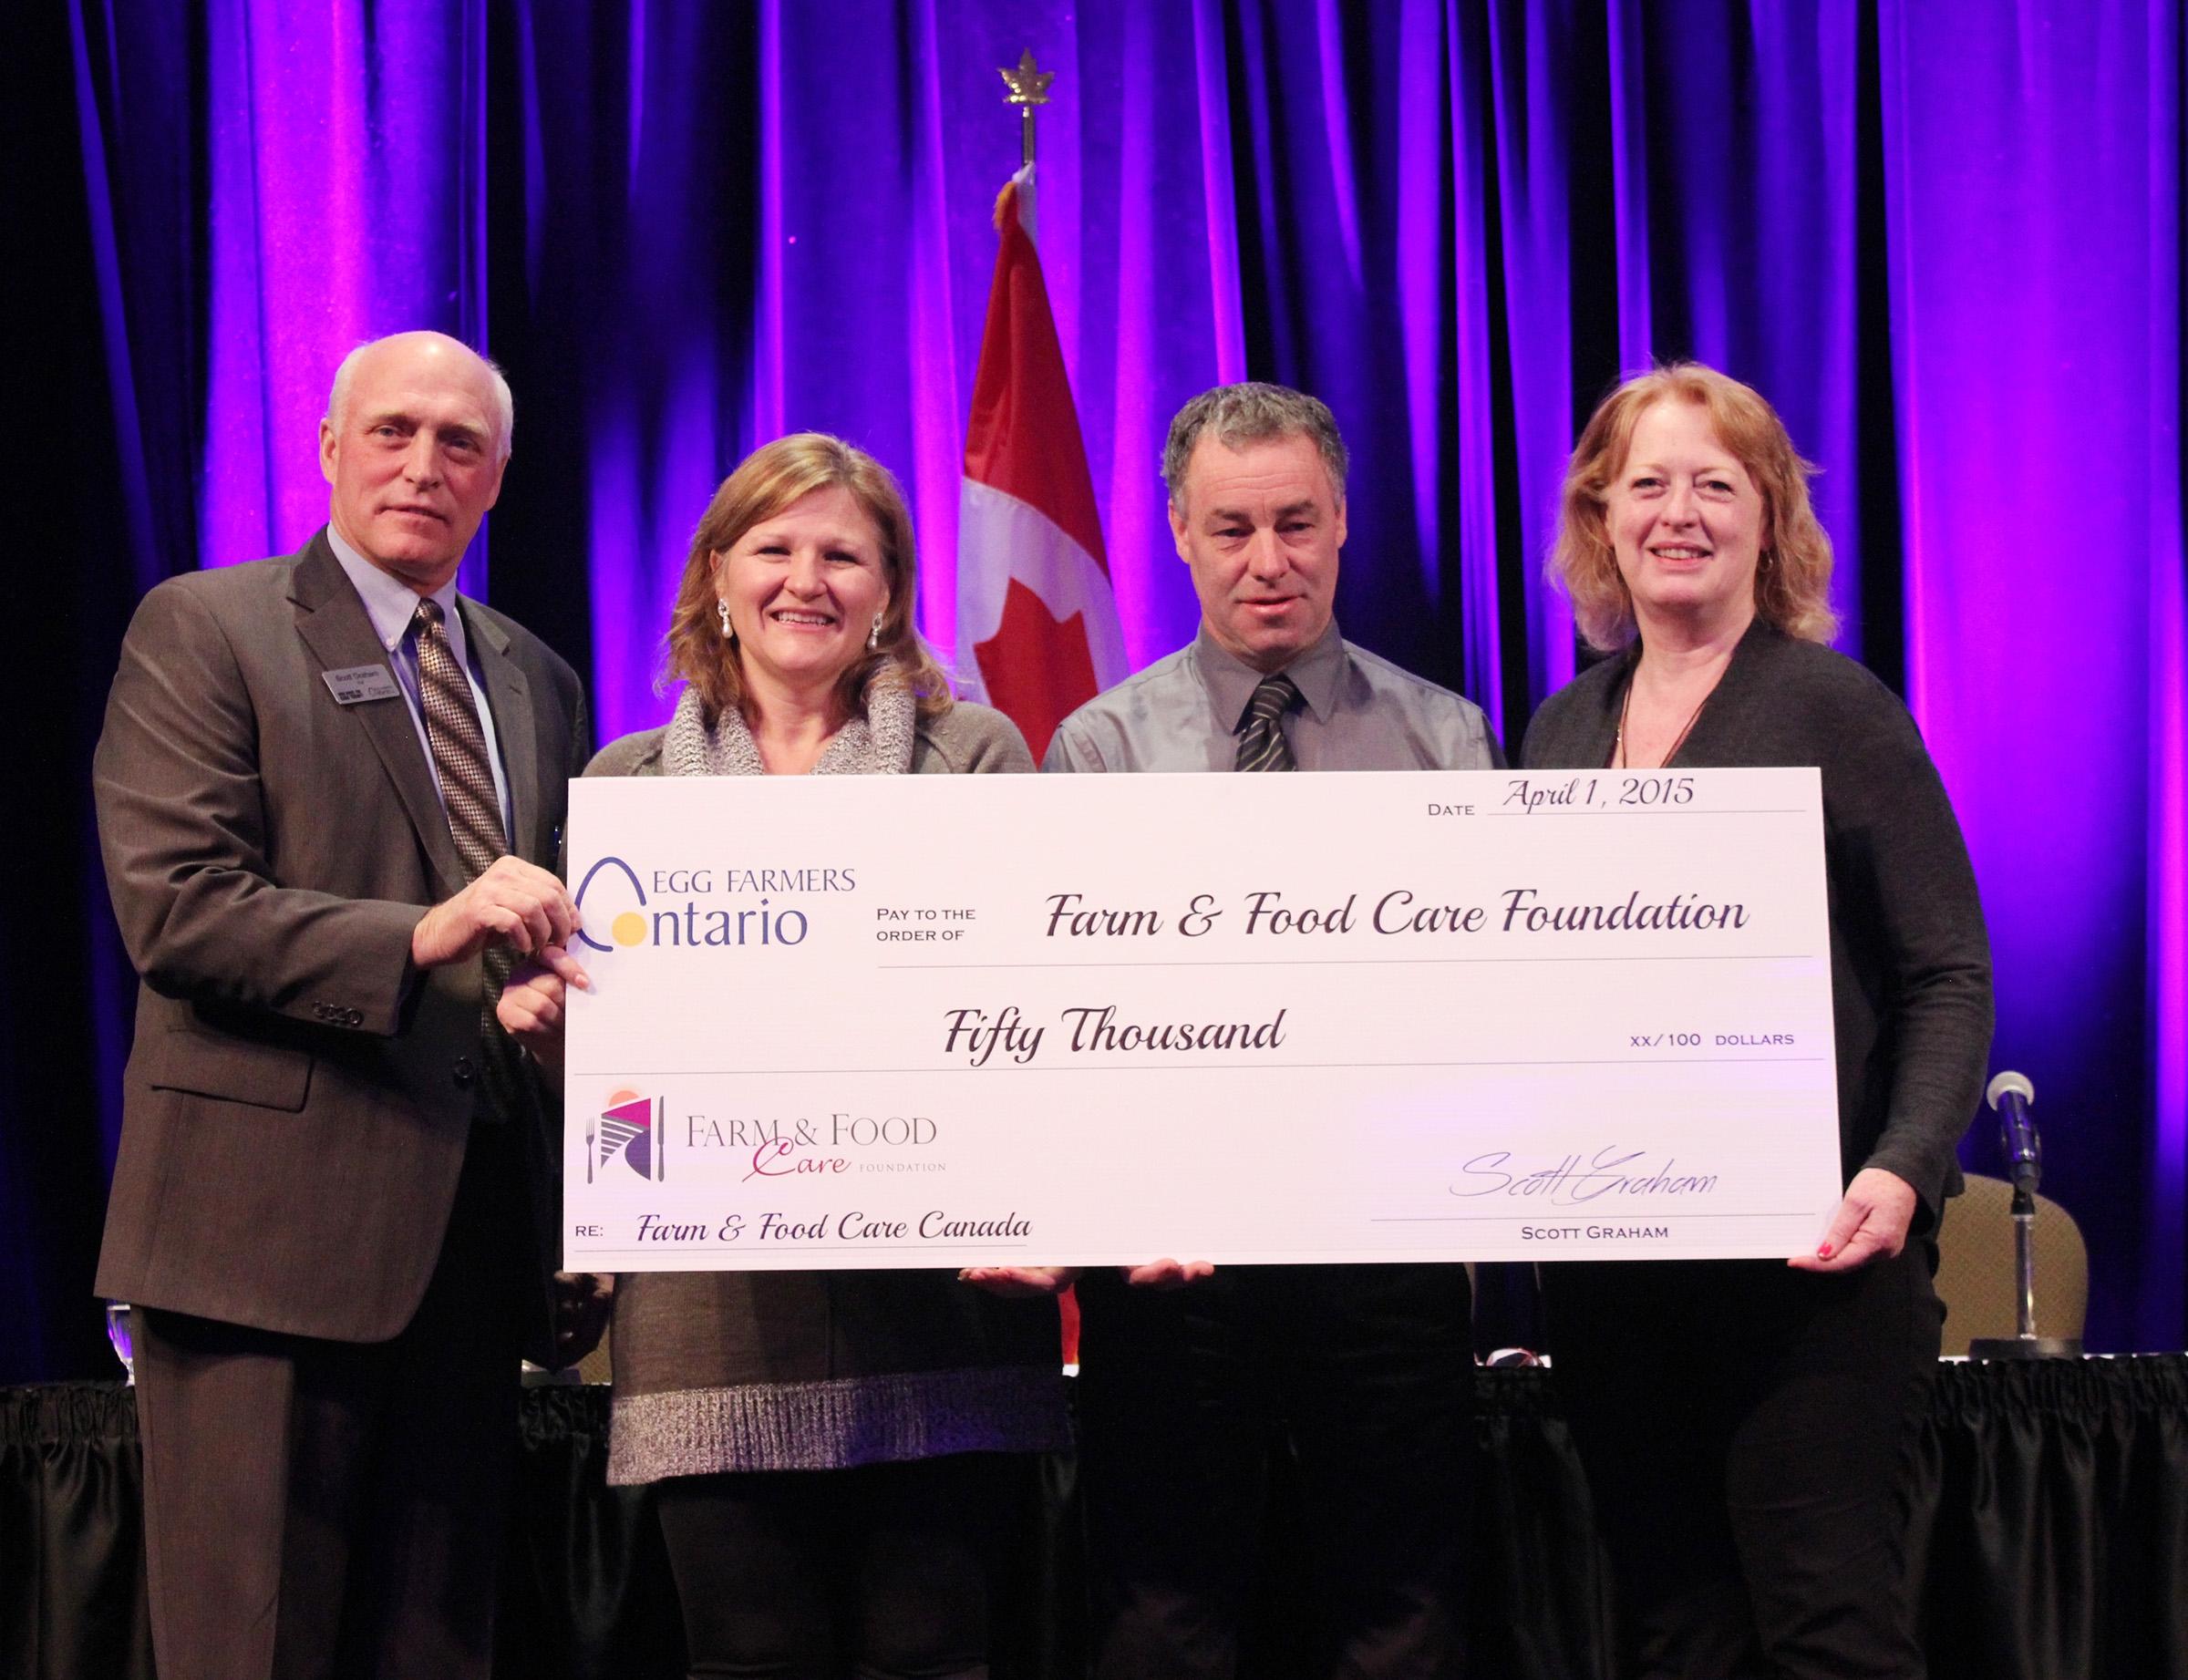 Egg Farmers of Ontario donate $50,000 to Farm & Food Care ...